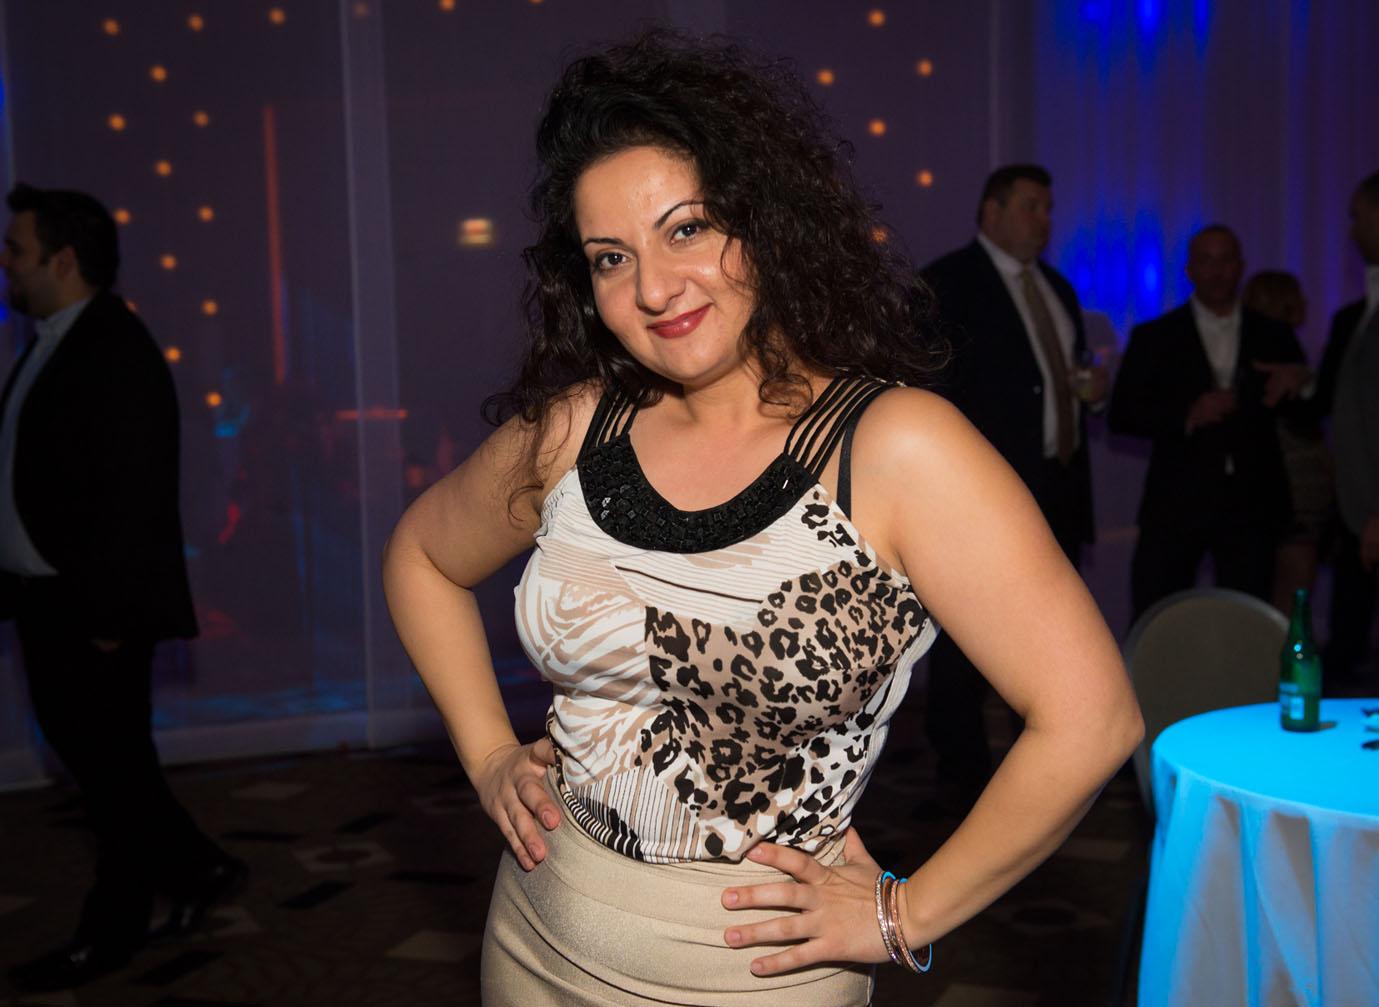 2015-12-09 ReMax Corpoarte Event - The Borgata - Atlantic City NJ - Photo Sesh - 2015-5067.jpg